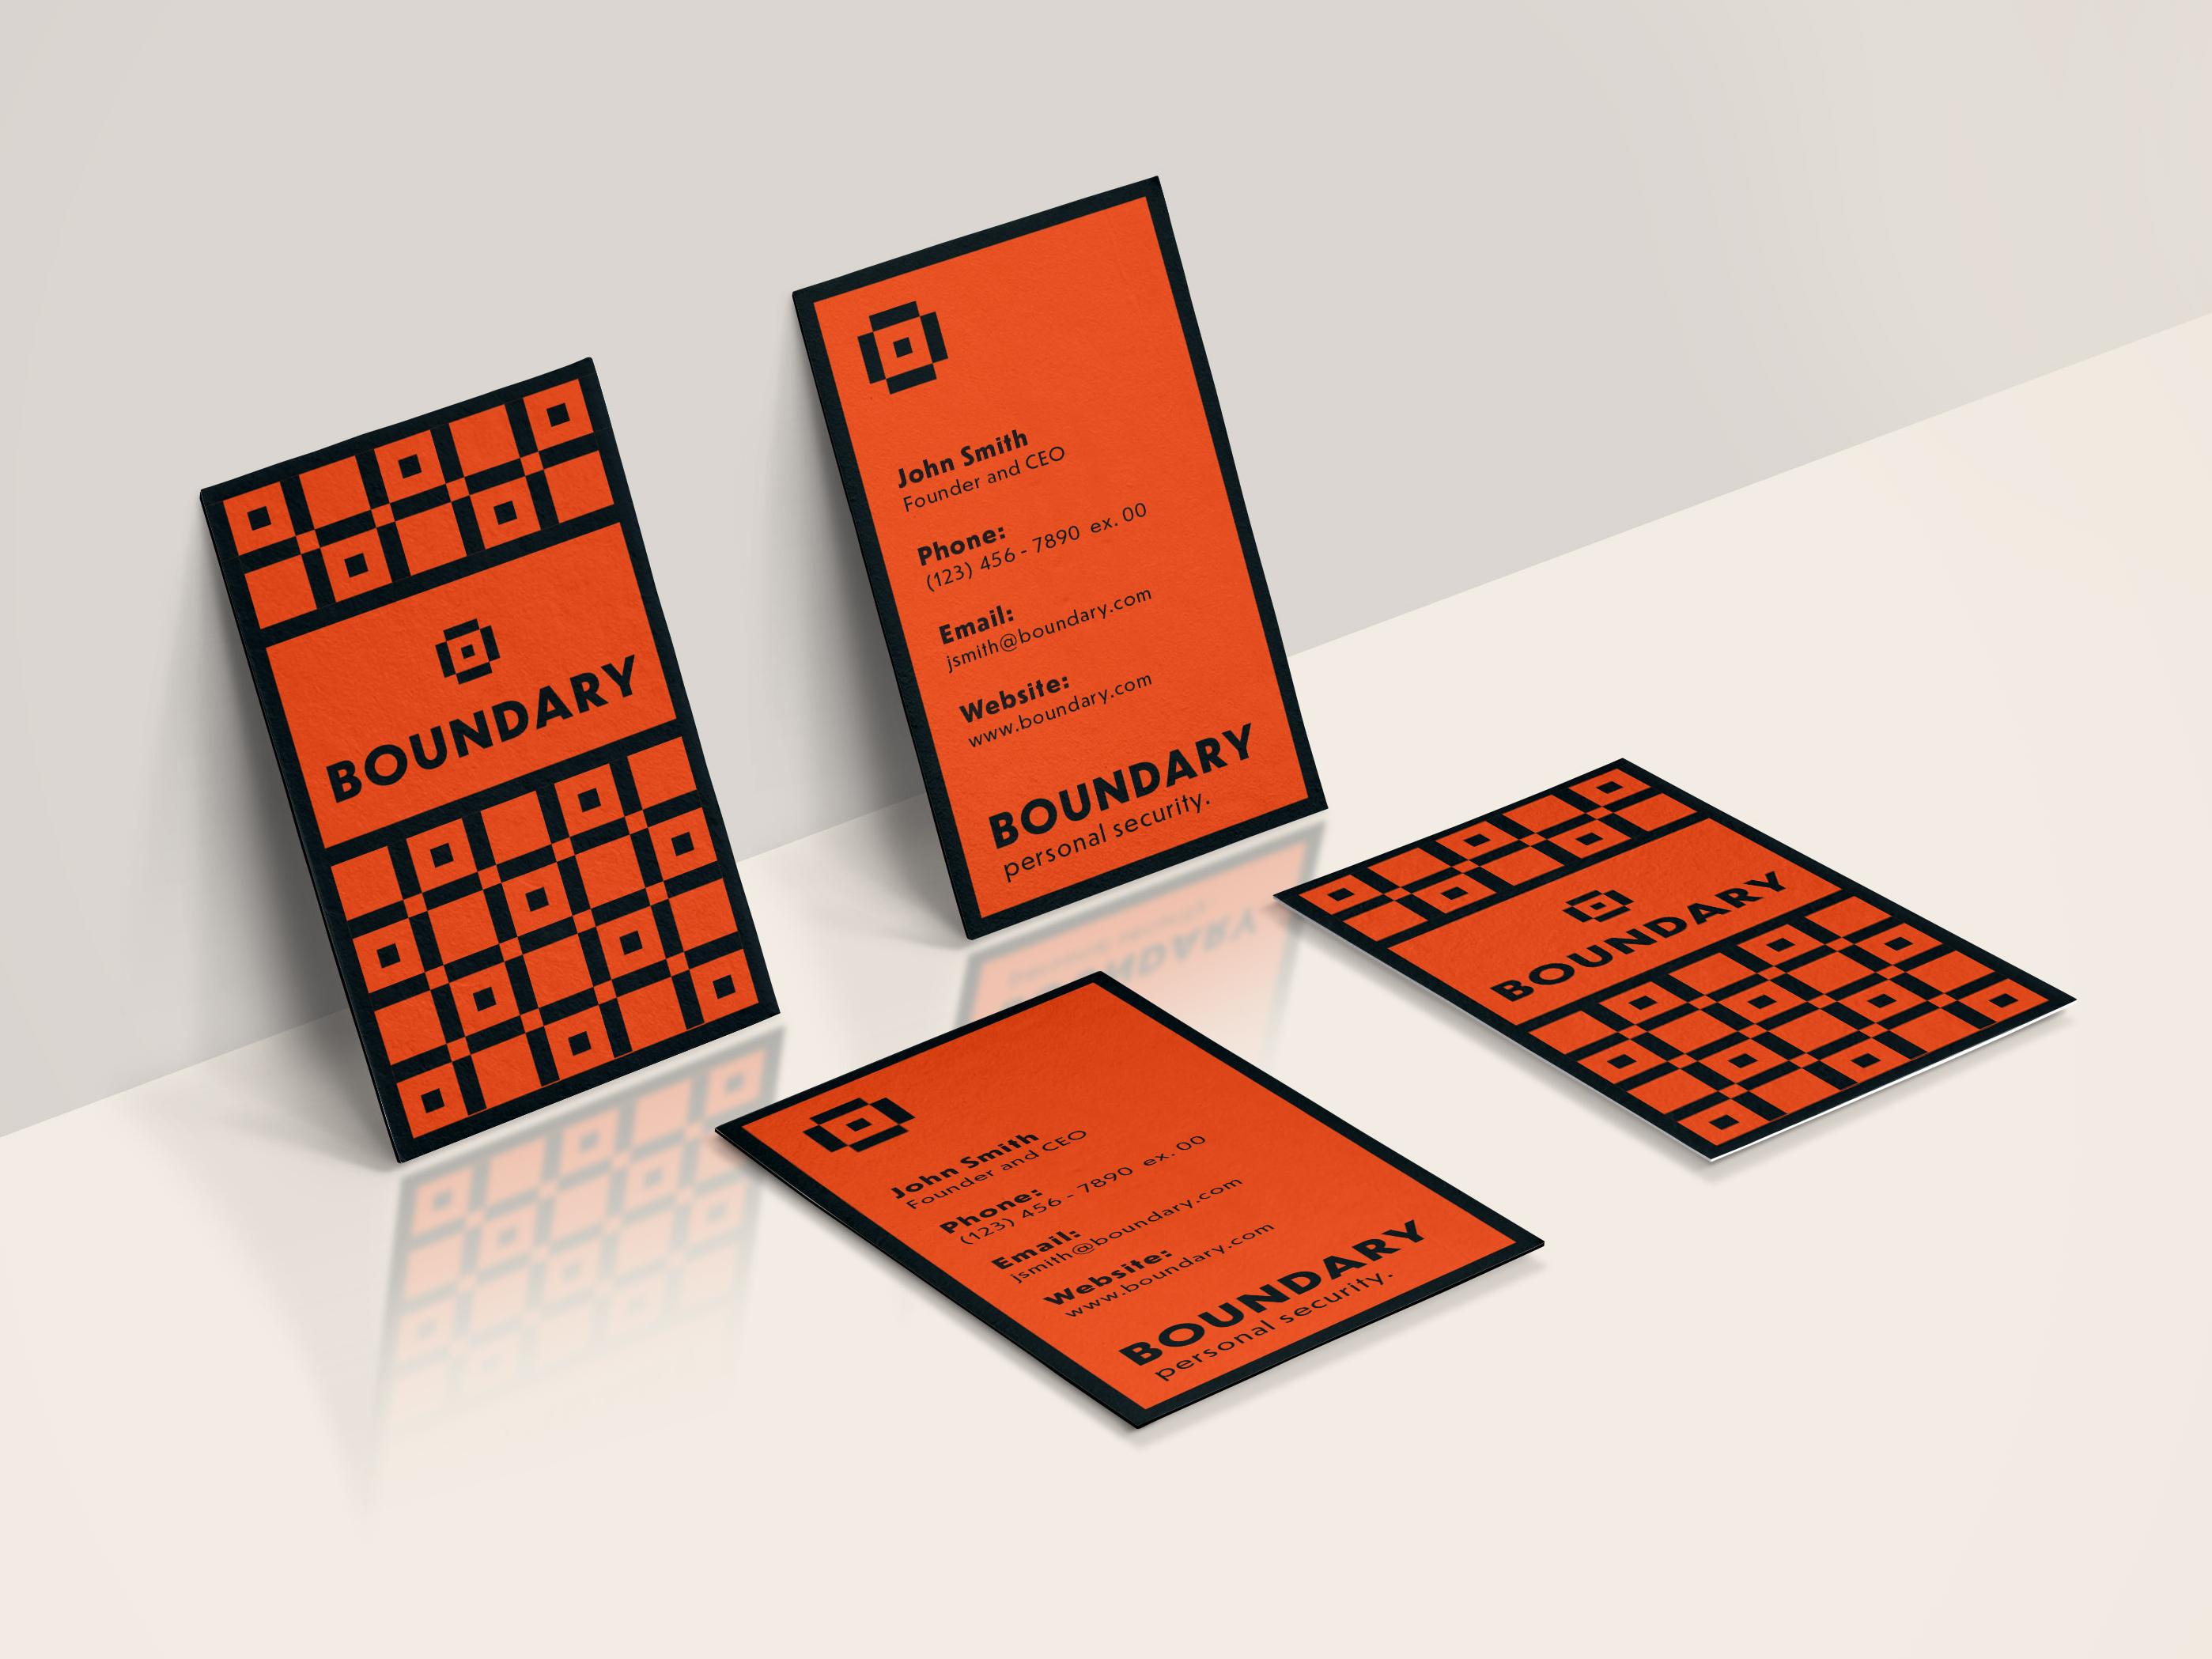 Boundary business card